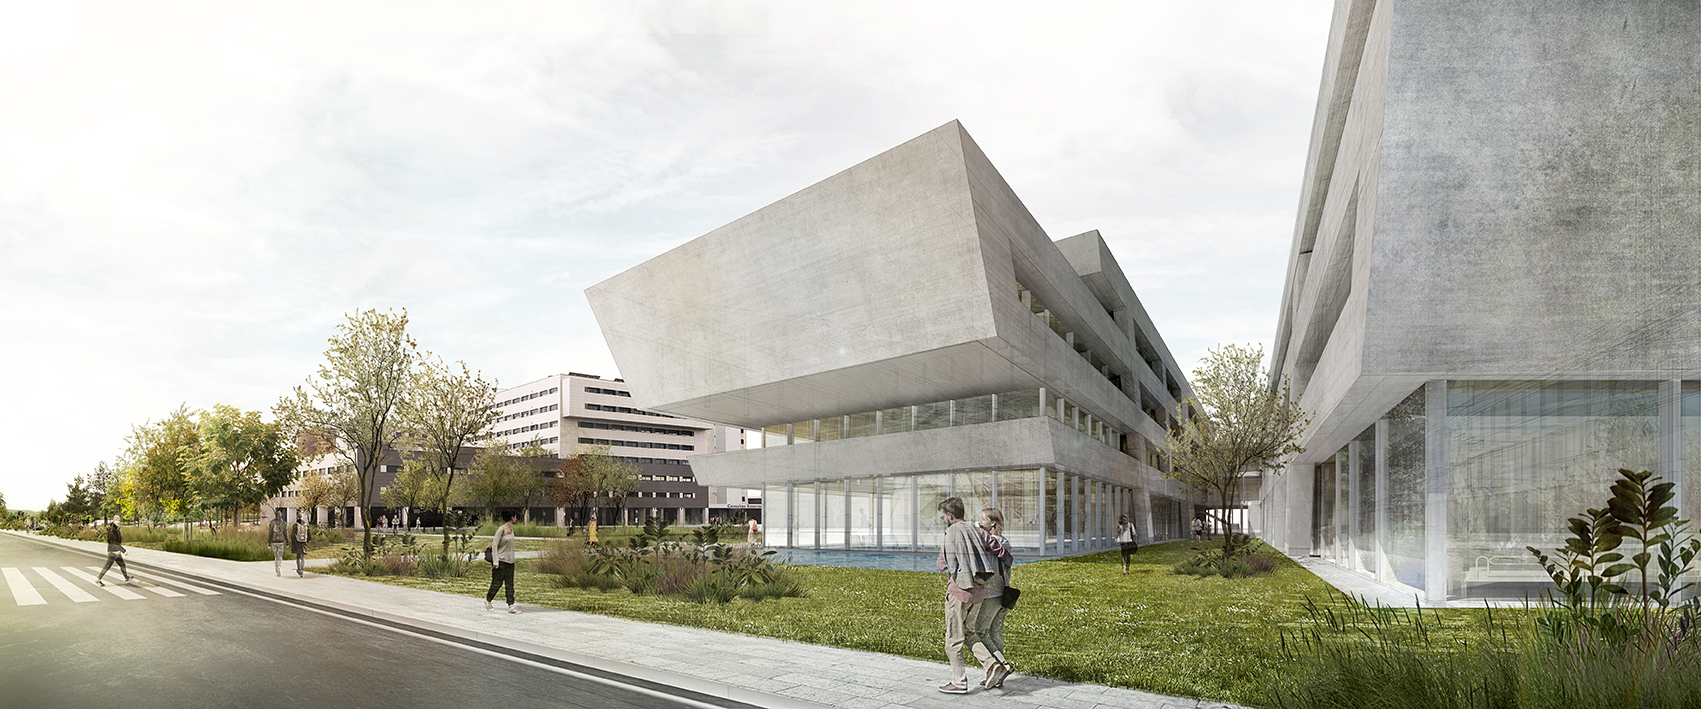 Facultad Medicina Badajoz, Alberto Garcia 03.jpg